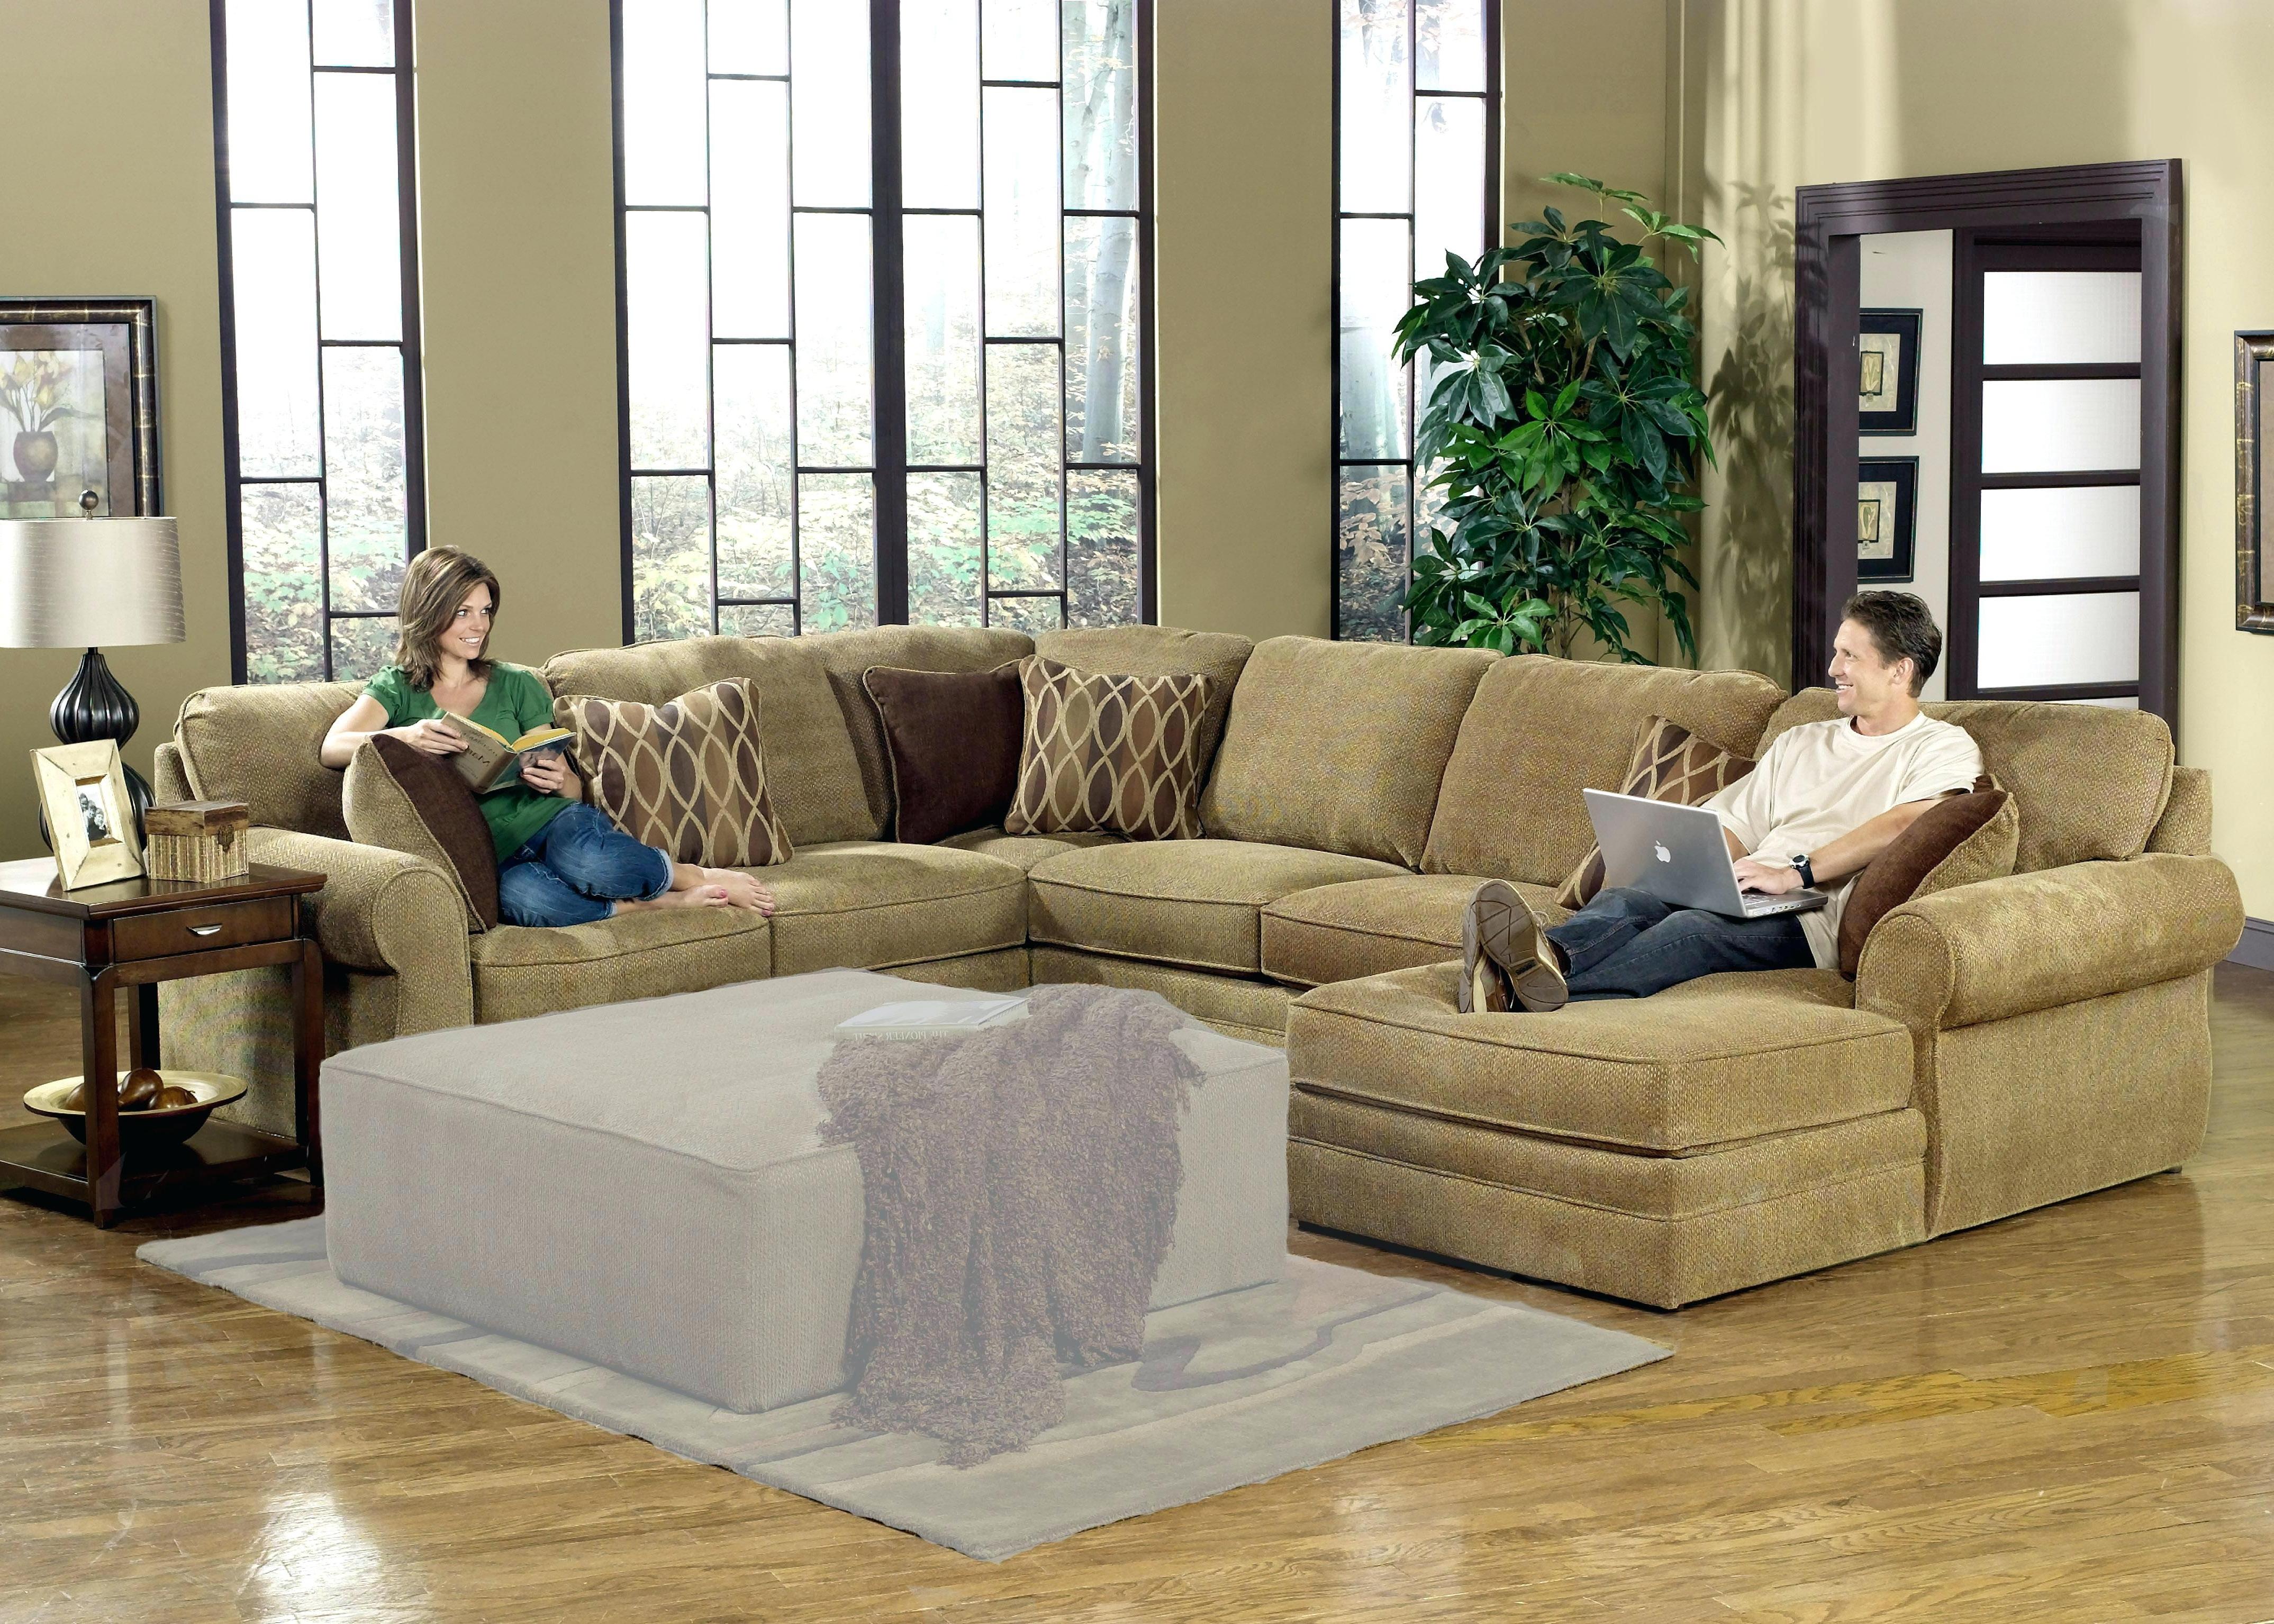 Famous U Shaped Sofa Sa For Cshis Chair Like Lips A Scorpion L Ikea Price Regarding U Shaped Sectionals (View 5 of 20)